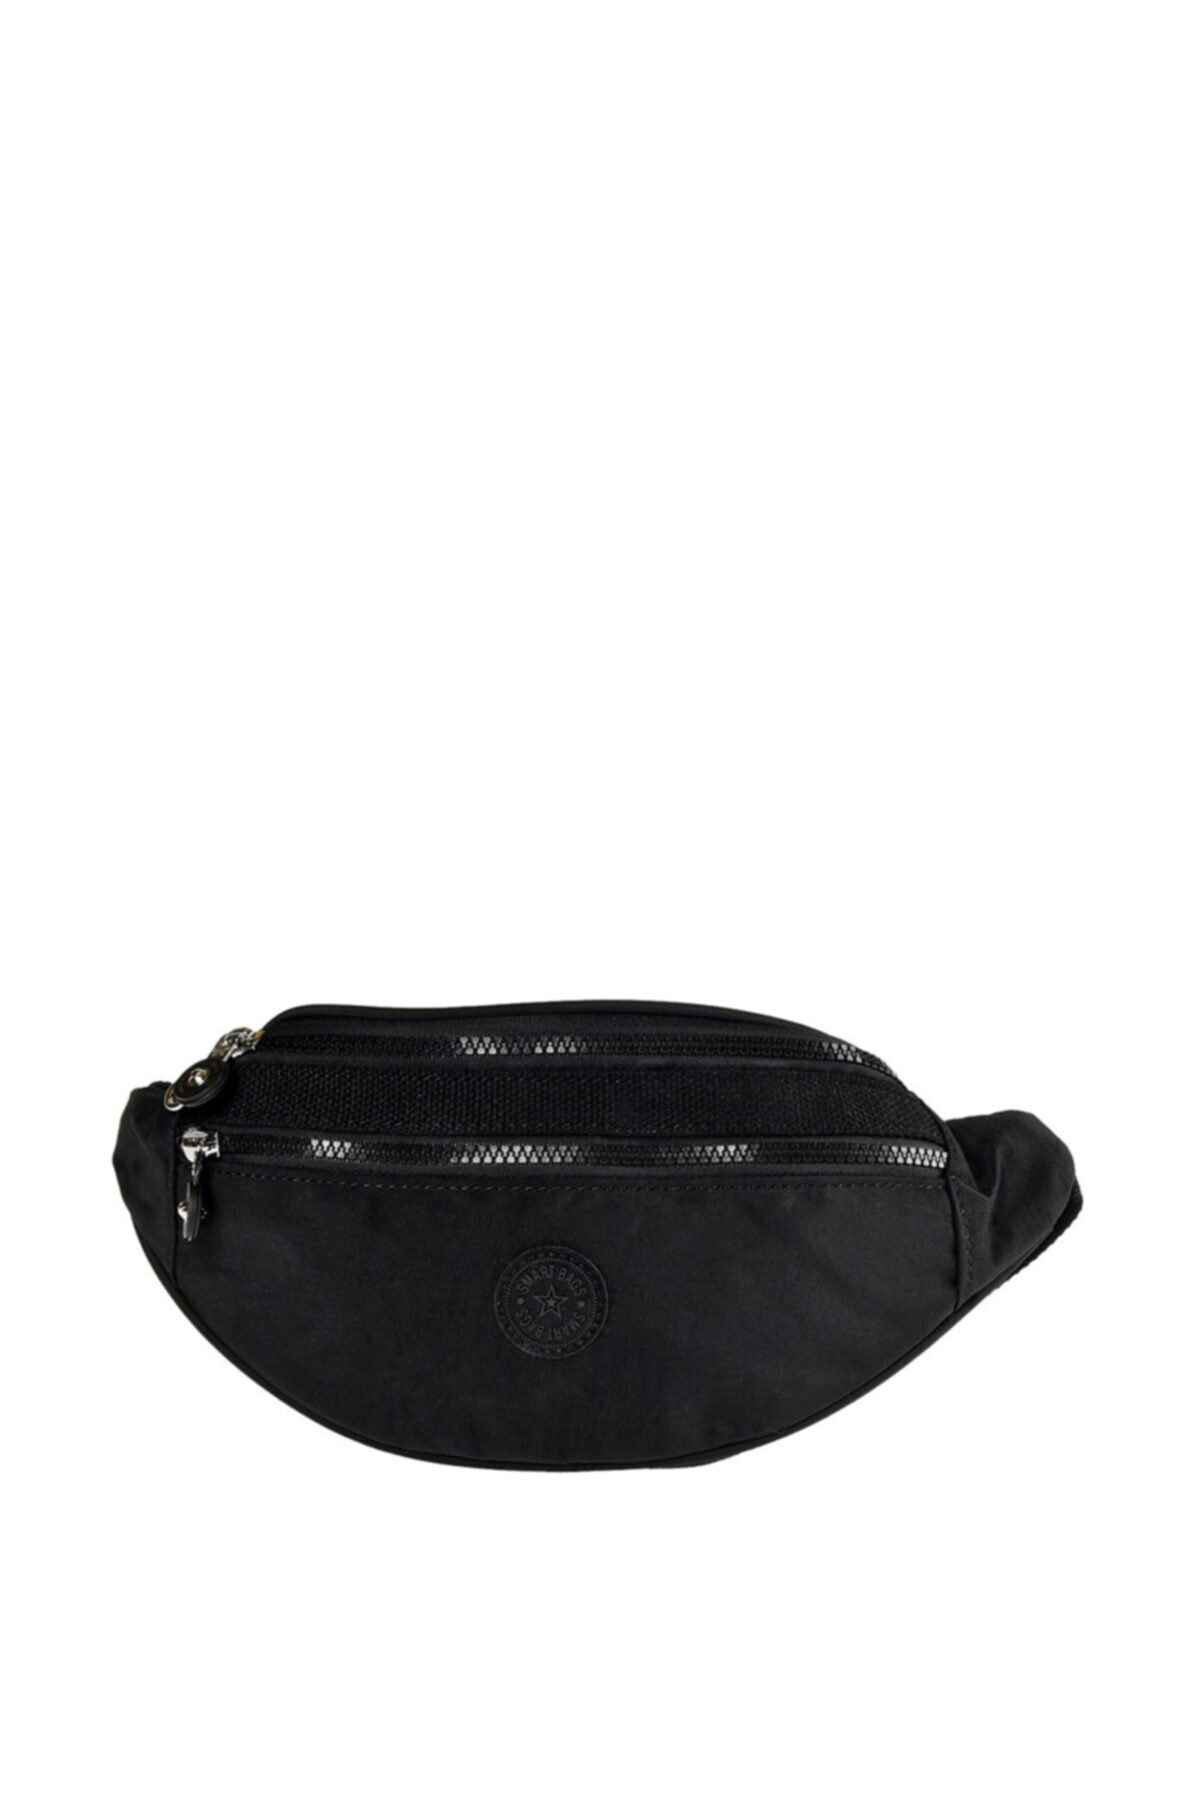 SMART BAGS Krinkıl Kumaş Çanta 1